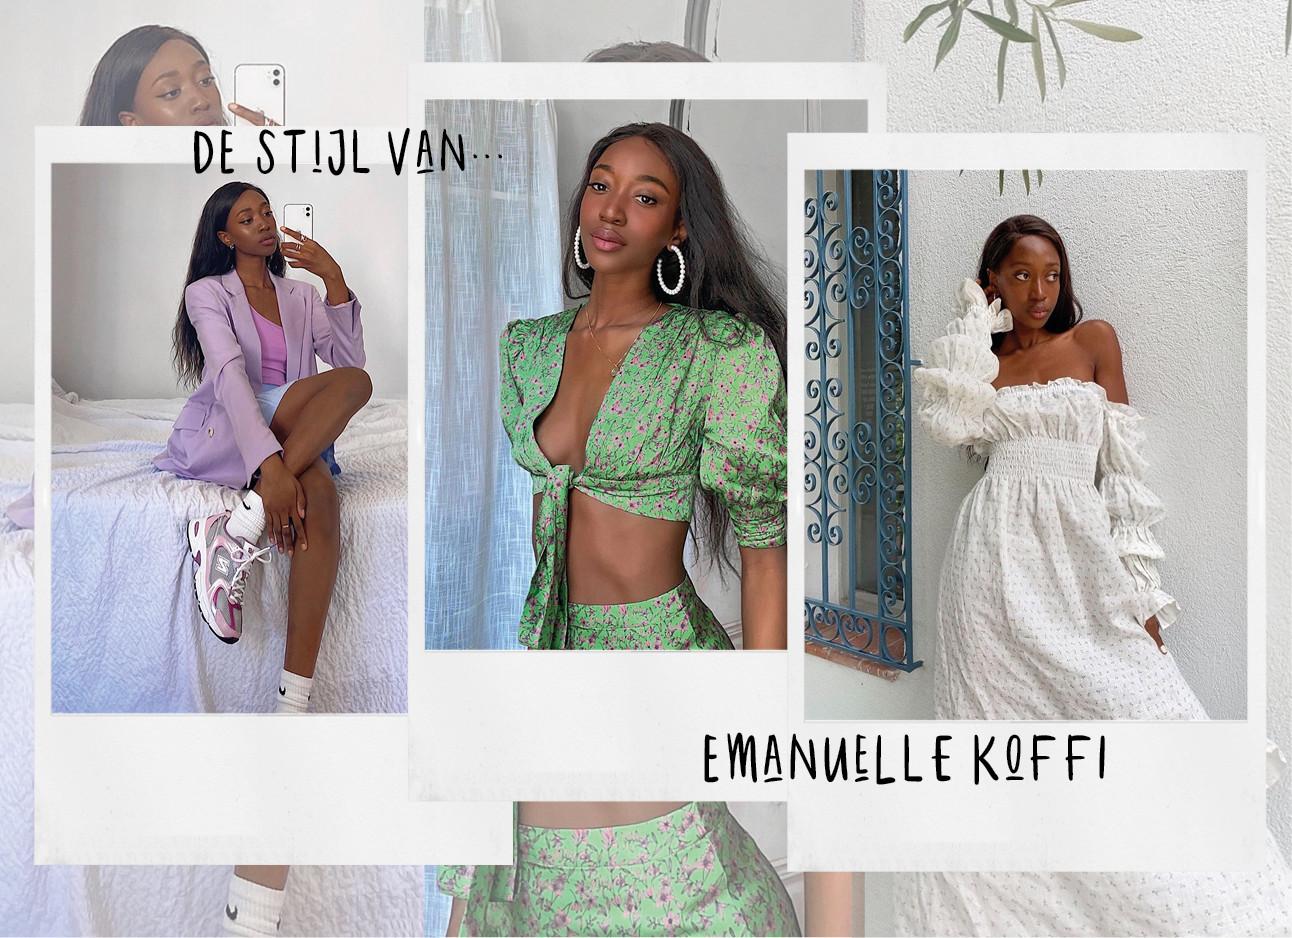 Om vandaag nog te copy-pasten De stijl van… Emmanuelle Koffi